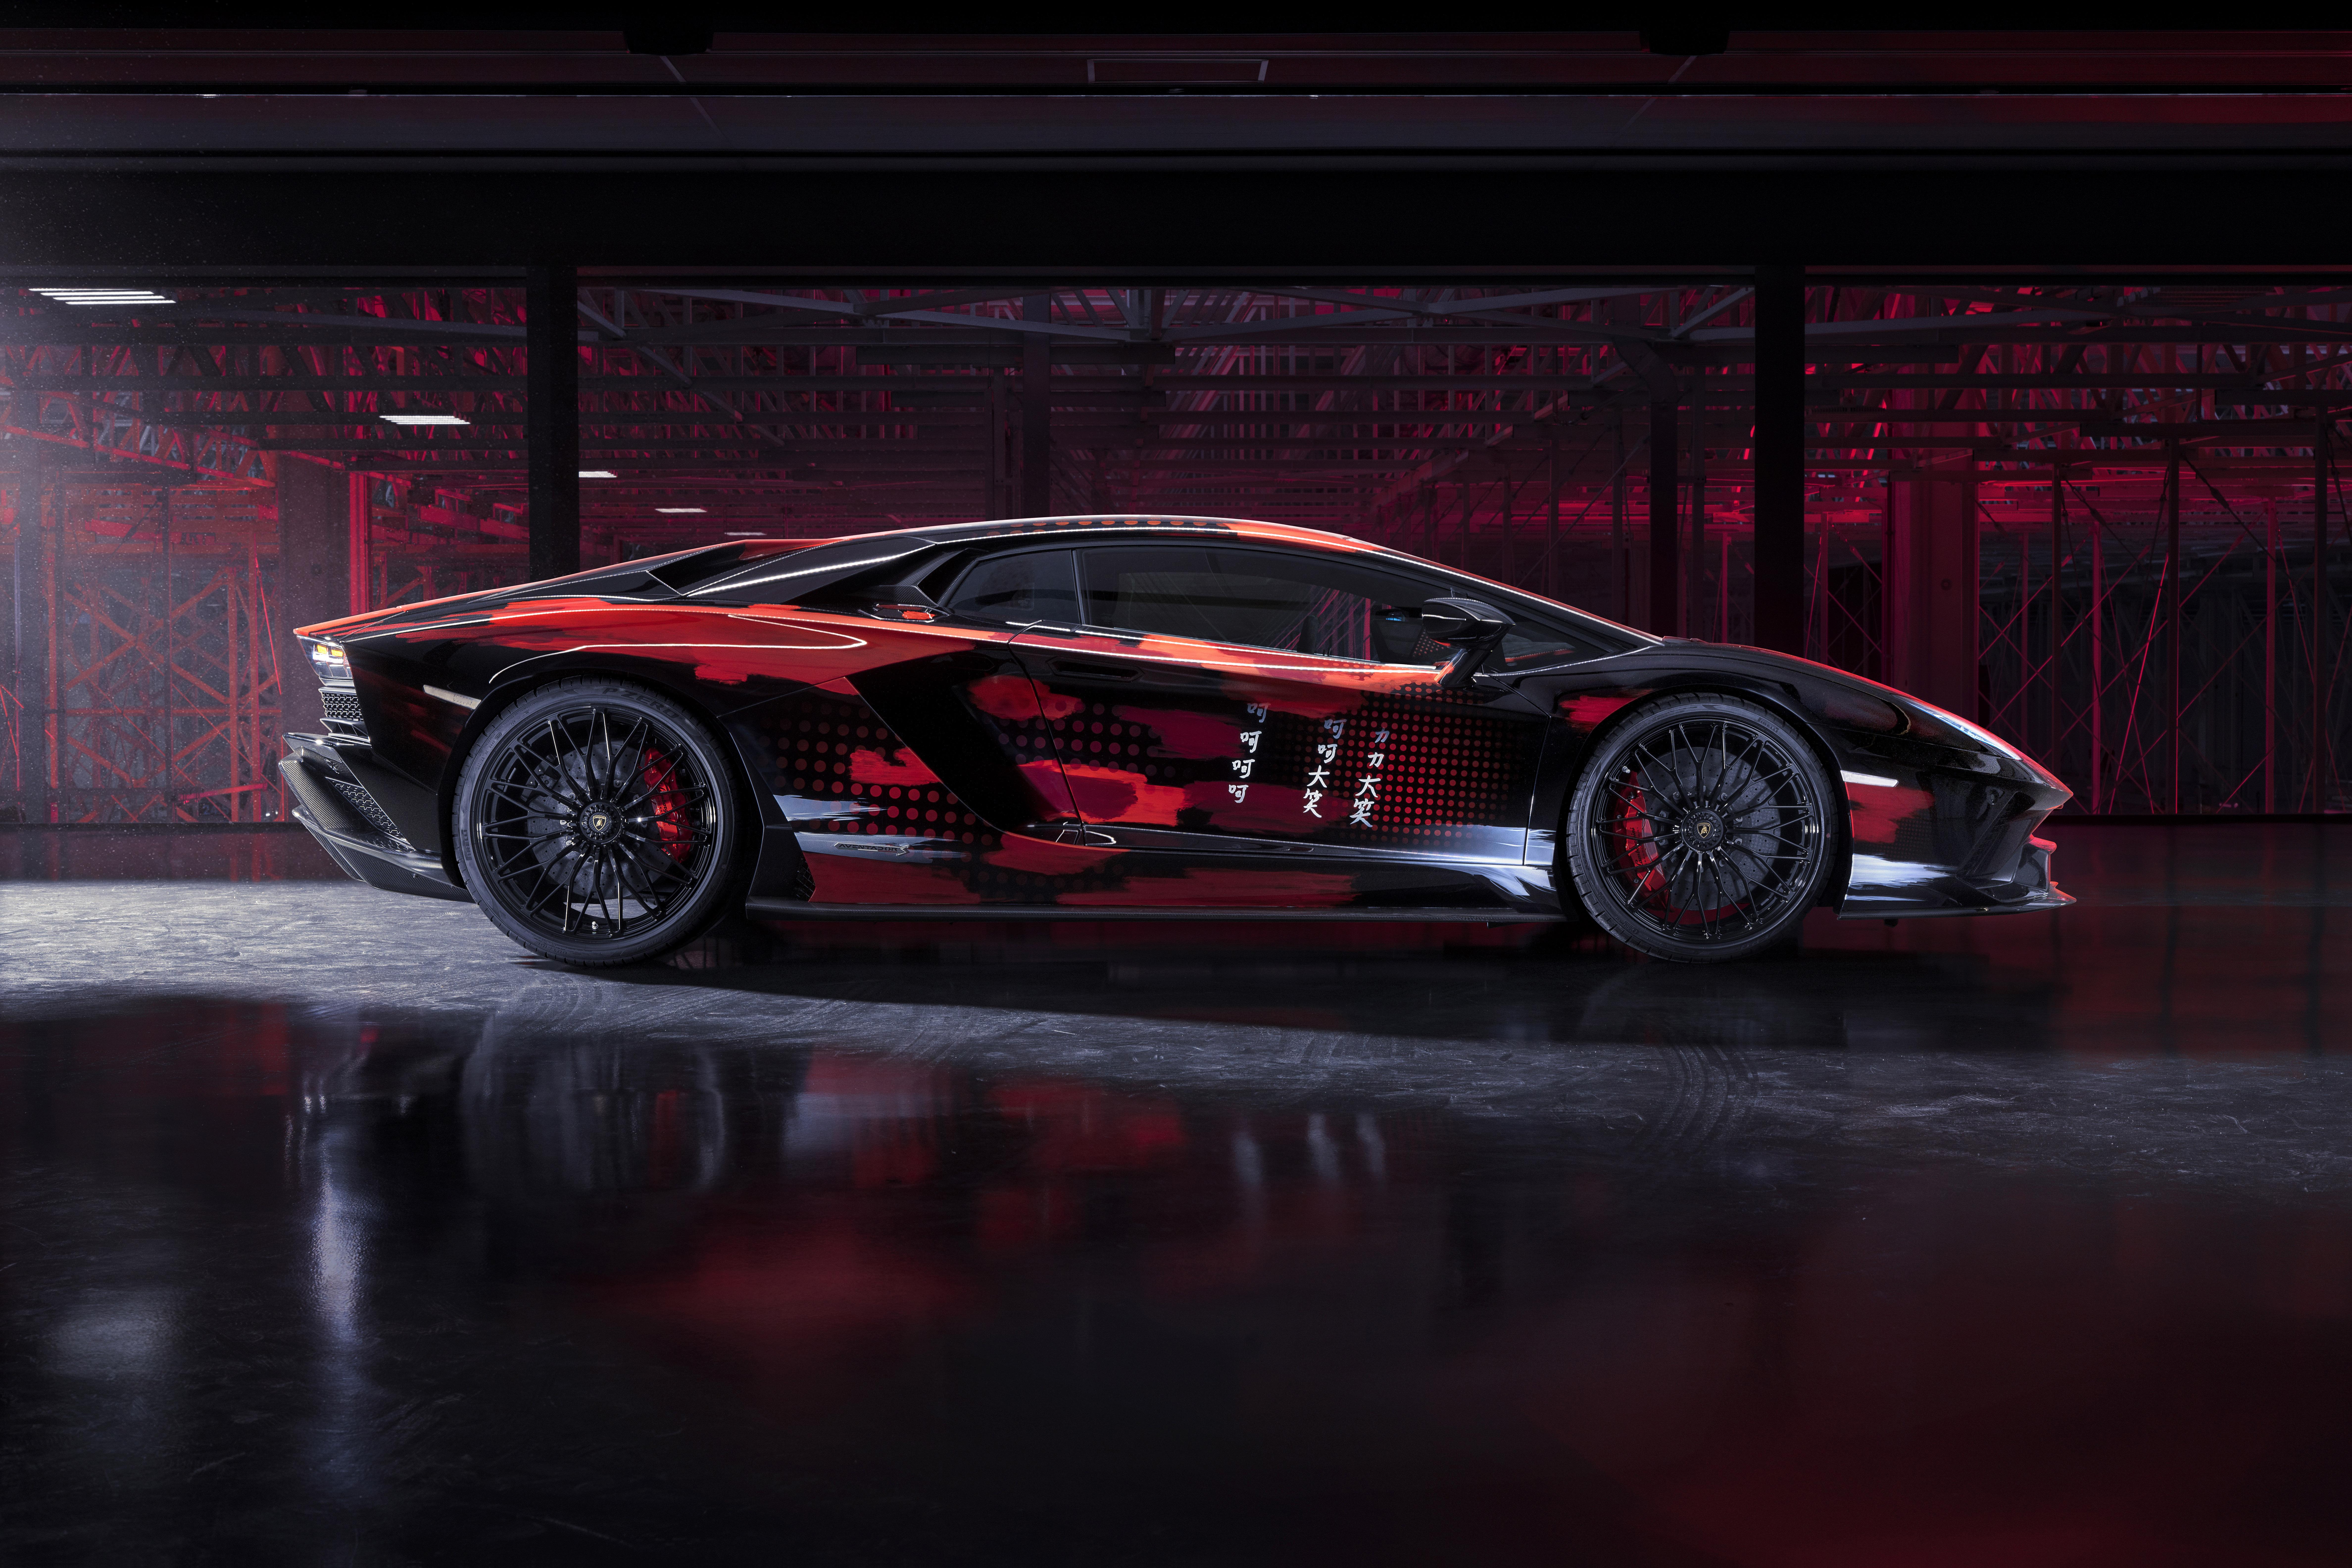 lamborghini aventador s 4k 1608909387 - Lamborghini Aventador S 4k - Lamborghini Aventador S 4k wallpapers